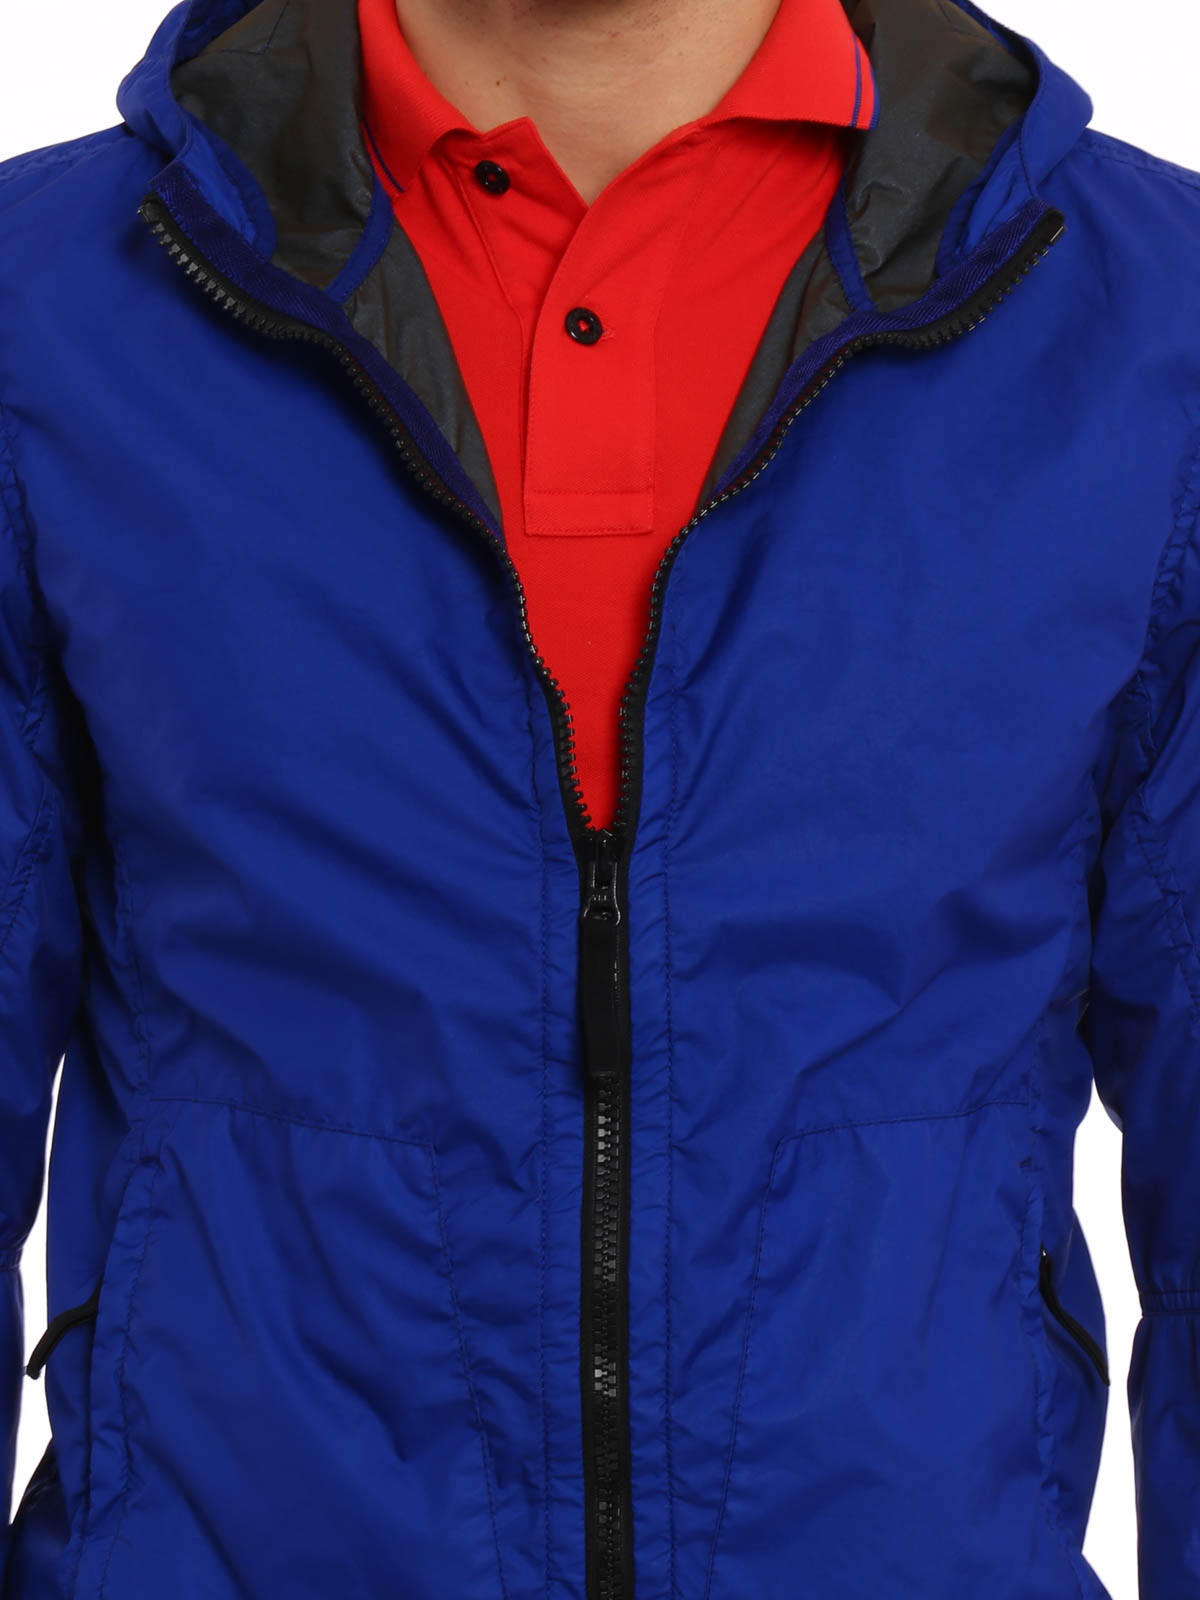 Stone Island buy online Membrana 3L Tc jacket